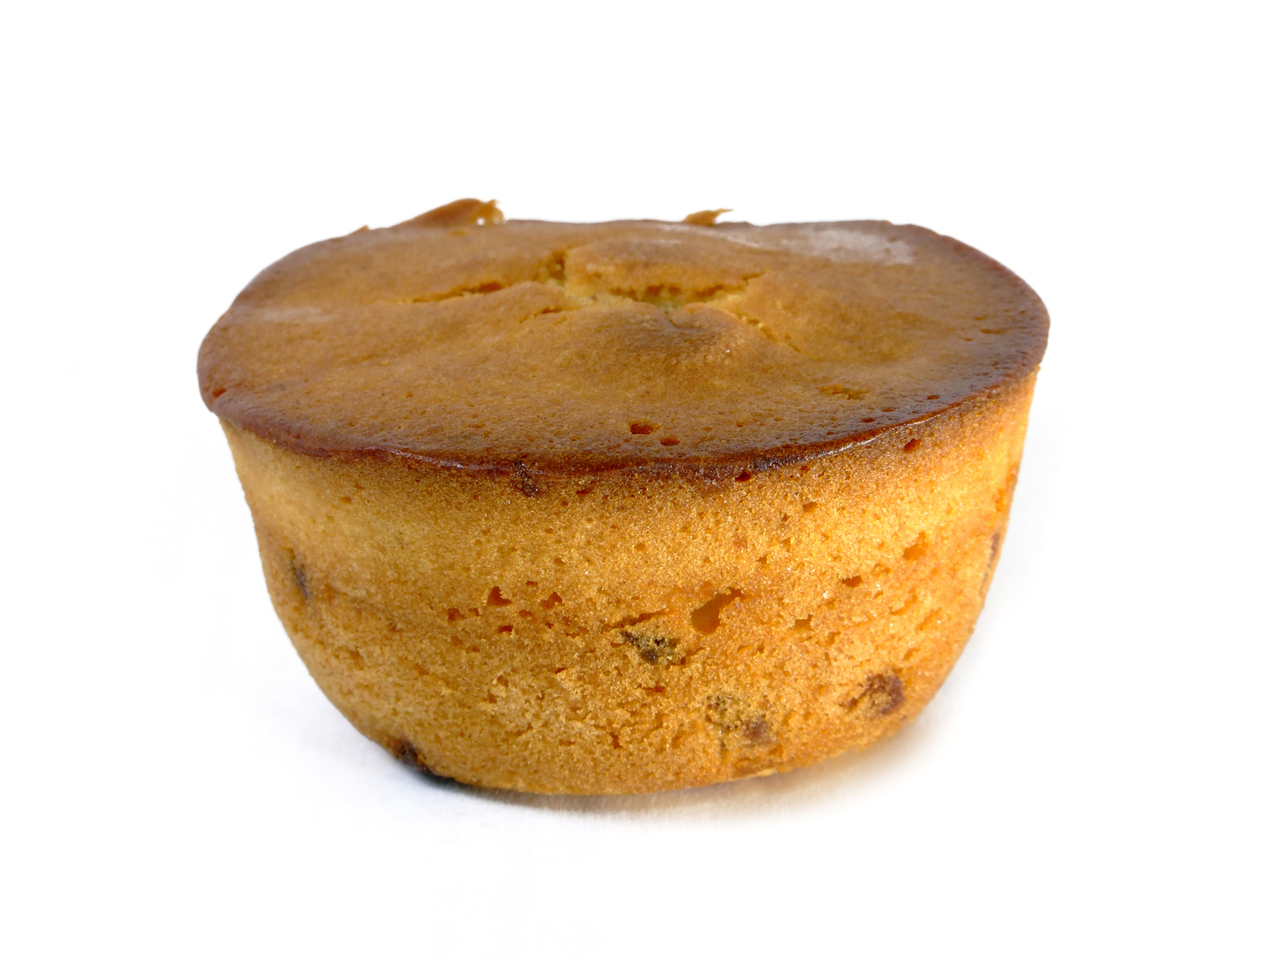 cake-1327914-1280x960